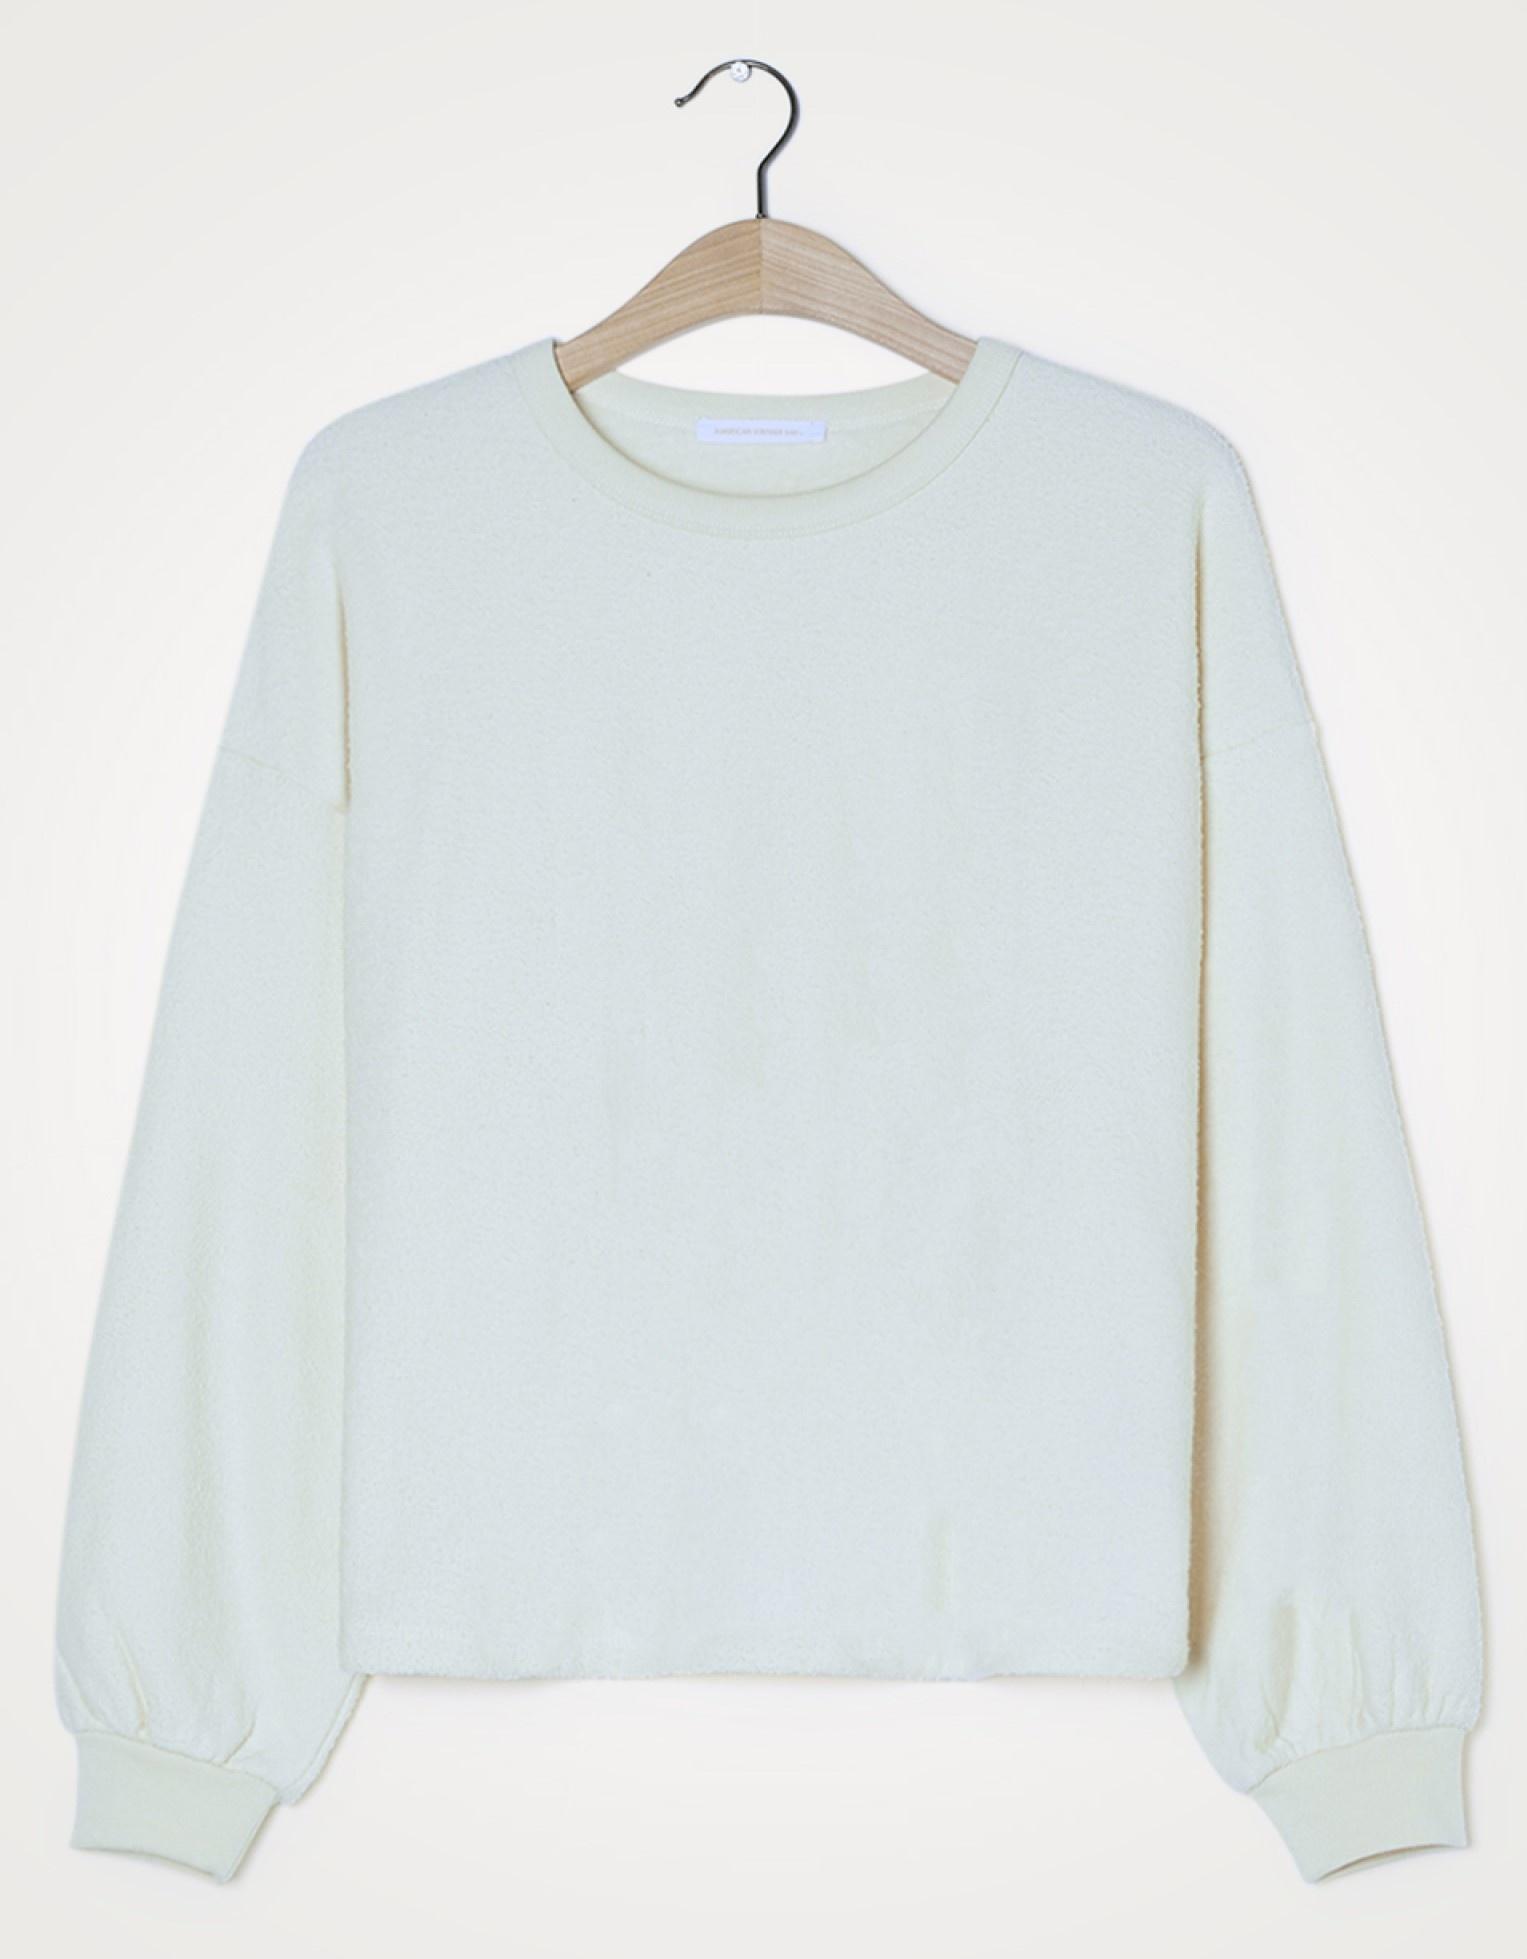 Sweater Bobypark ecru-2